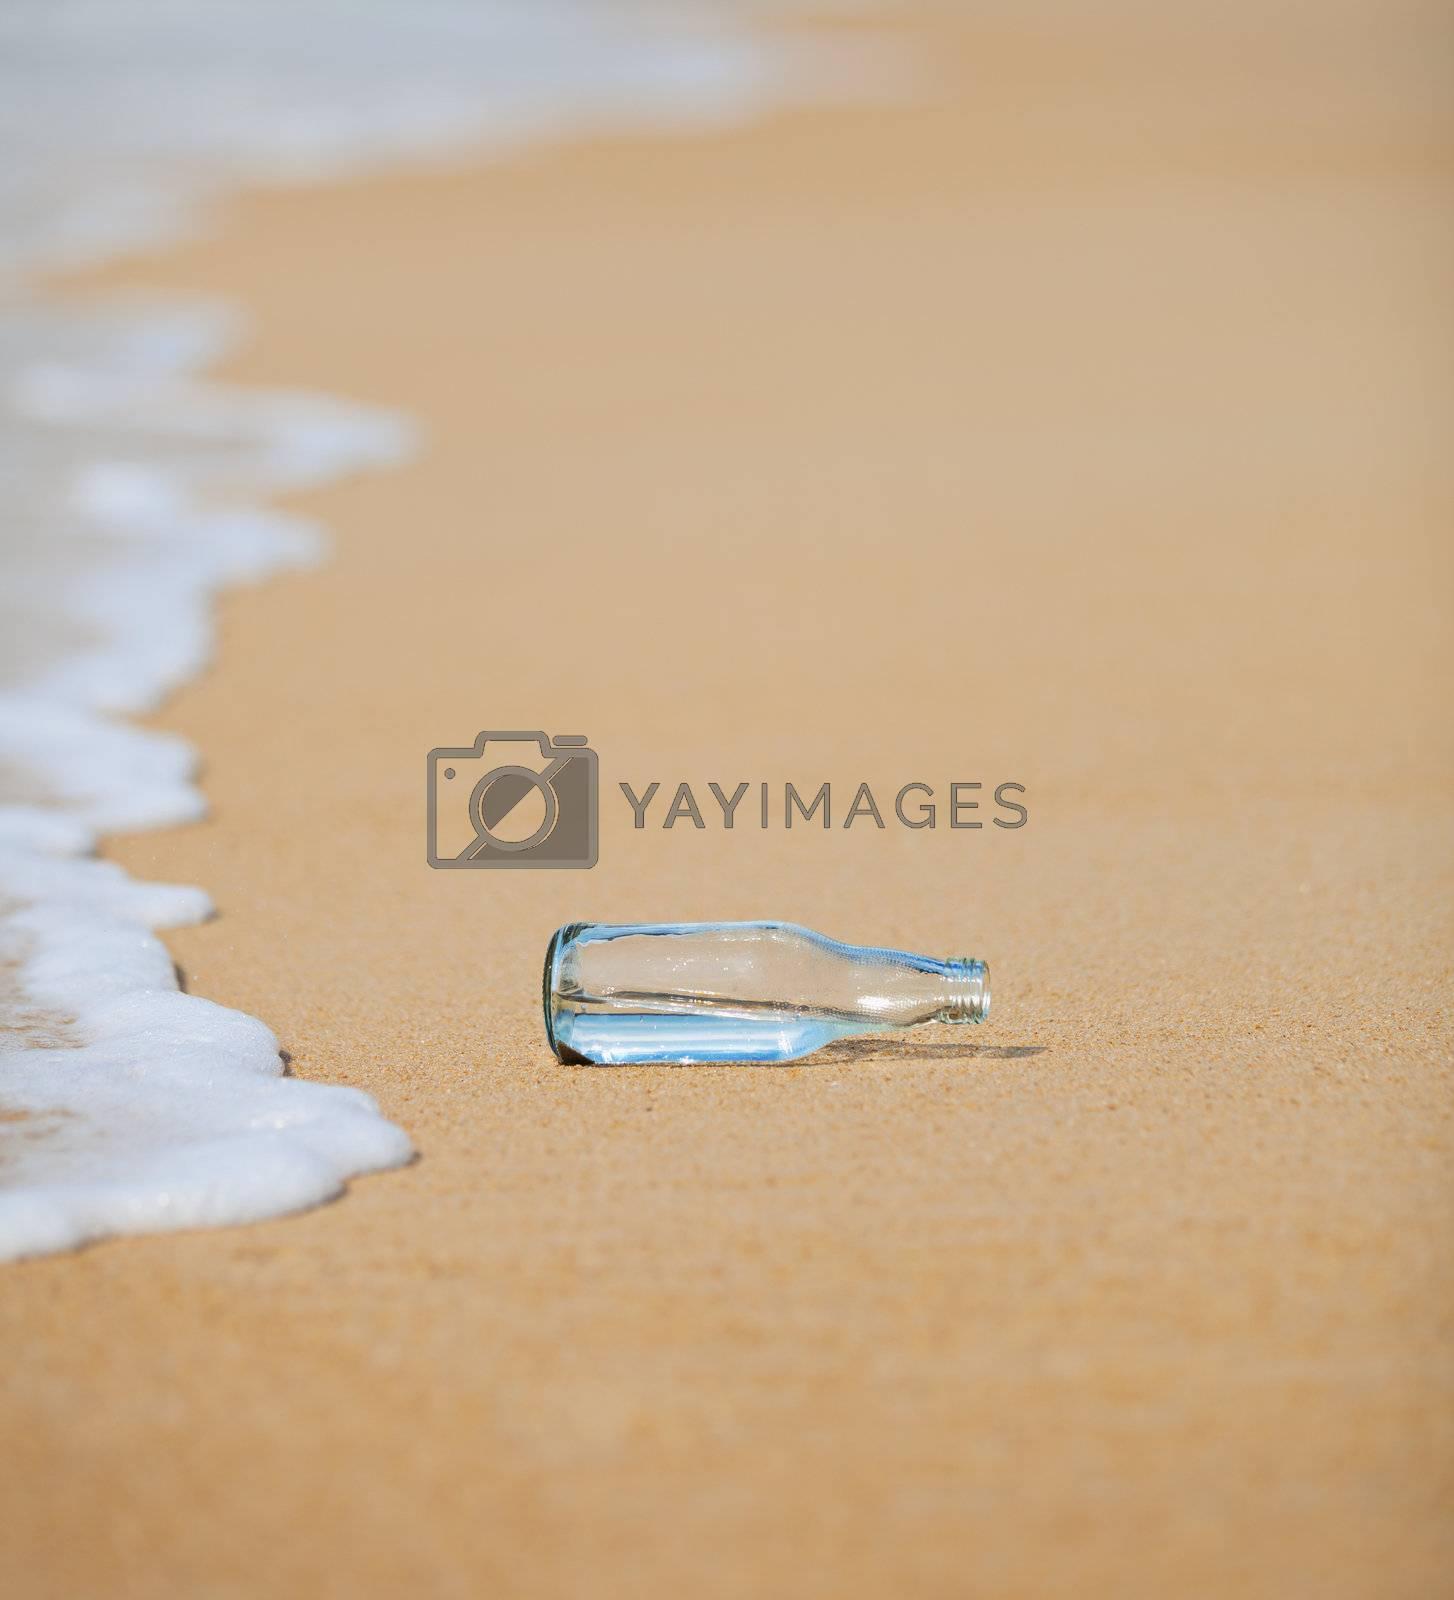 An empty bottle on the beach